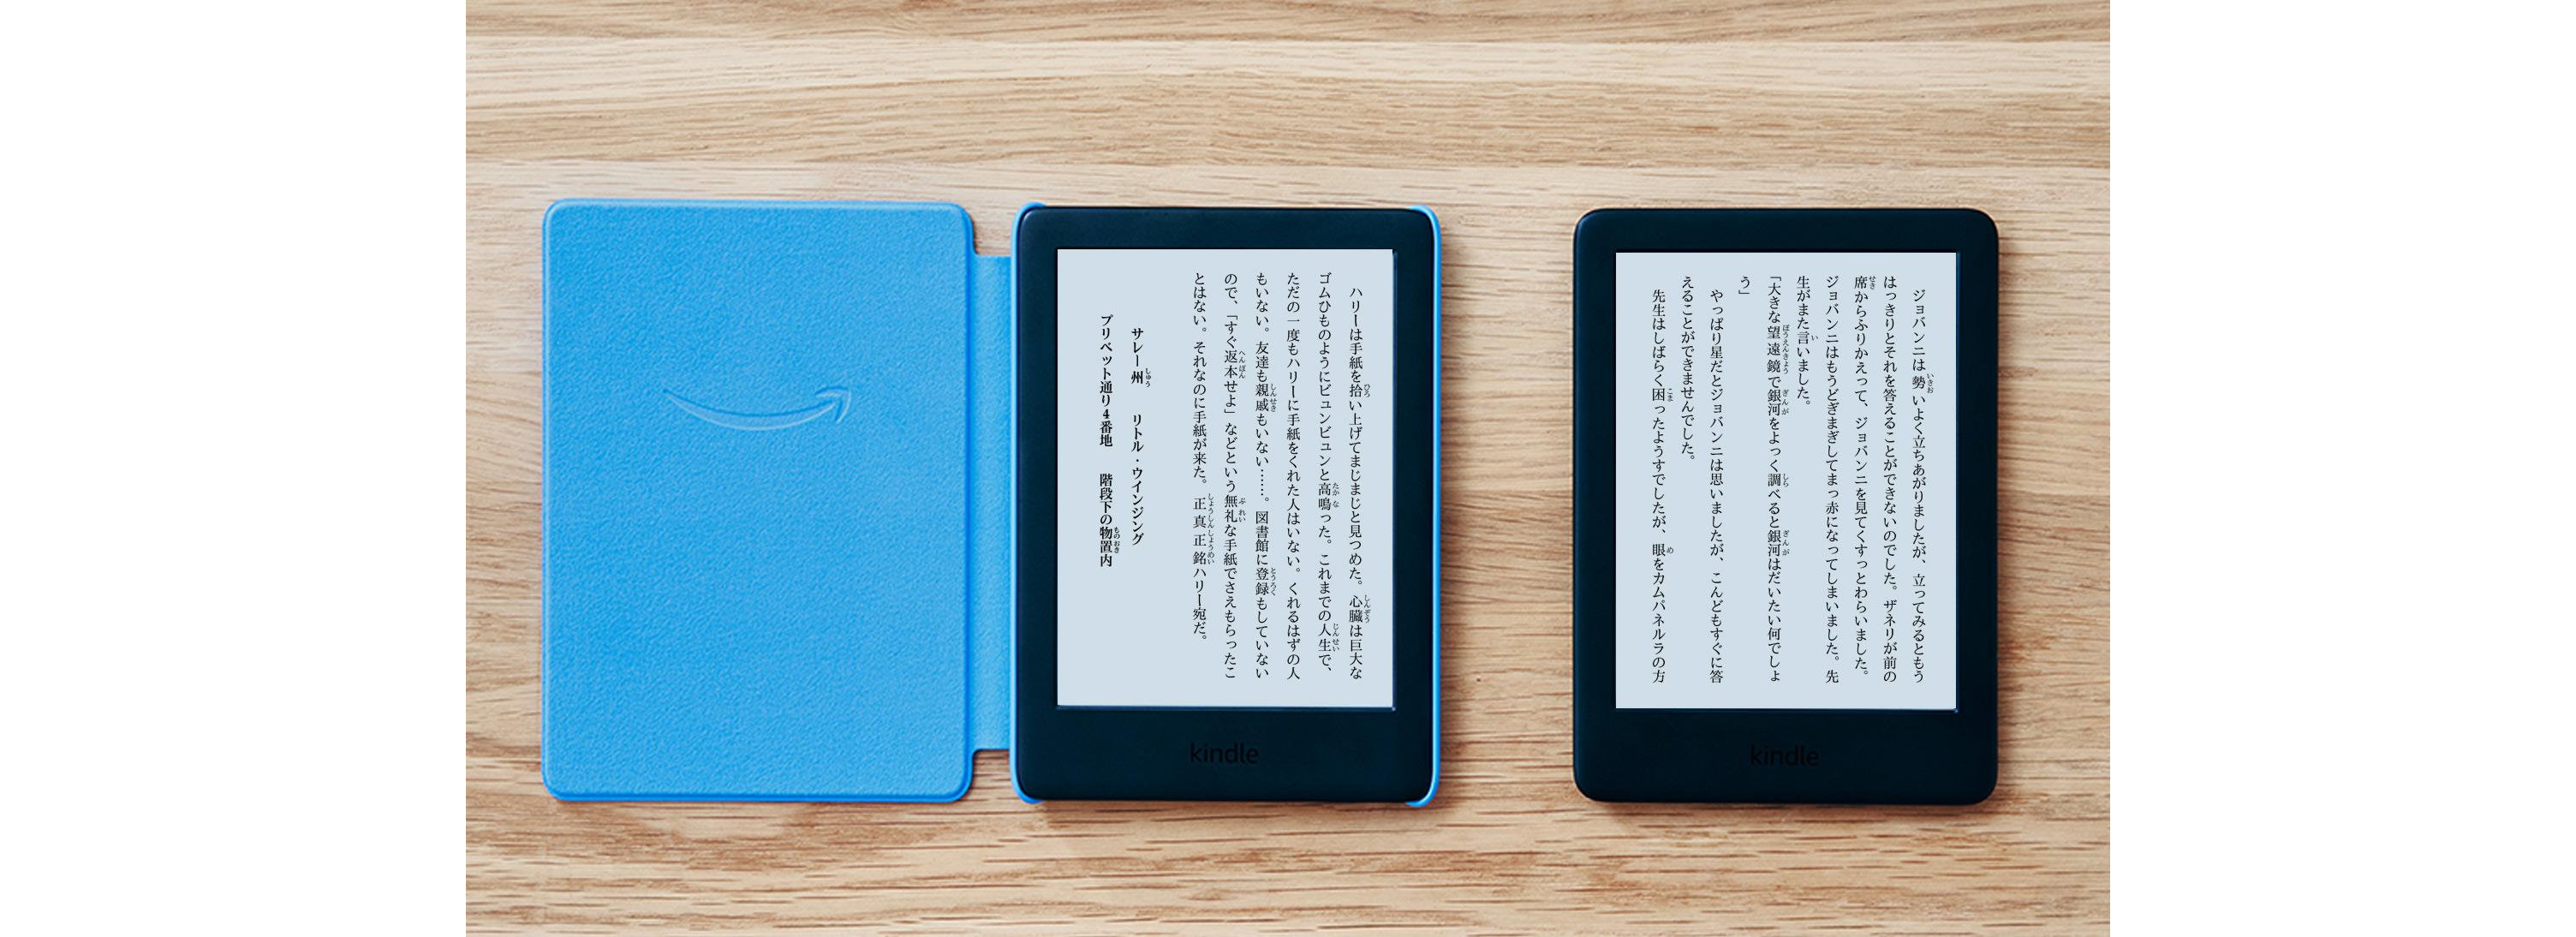 Kindleキッズモデル 大人にもKindleの読書体験を